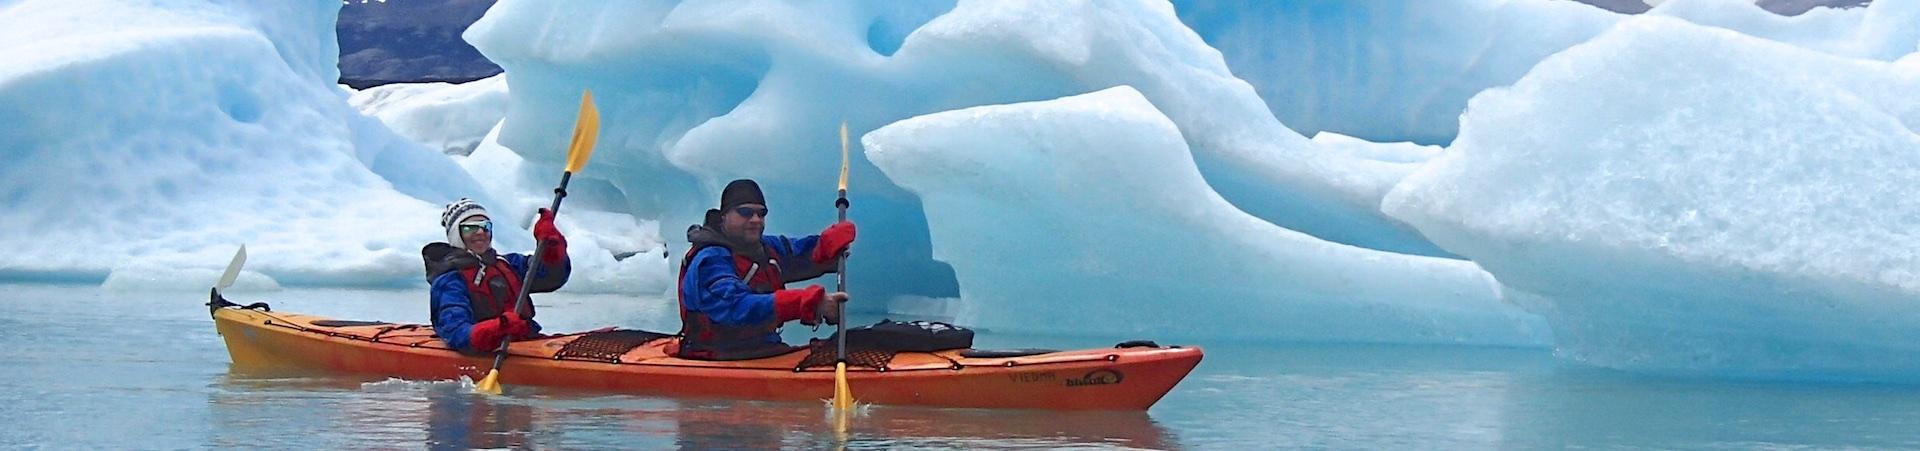 Upsala glacier kayaking